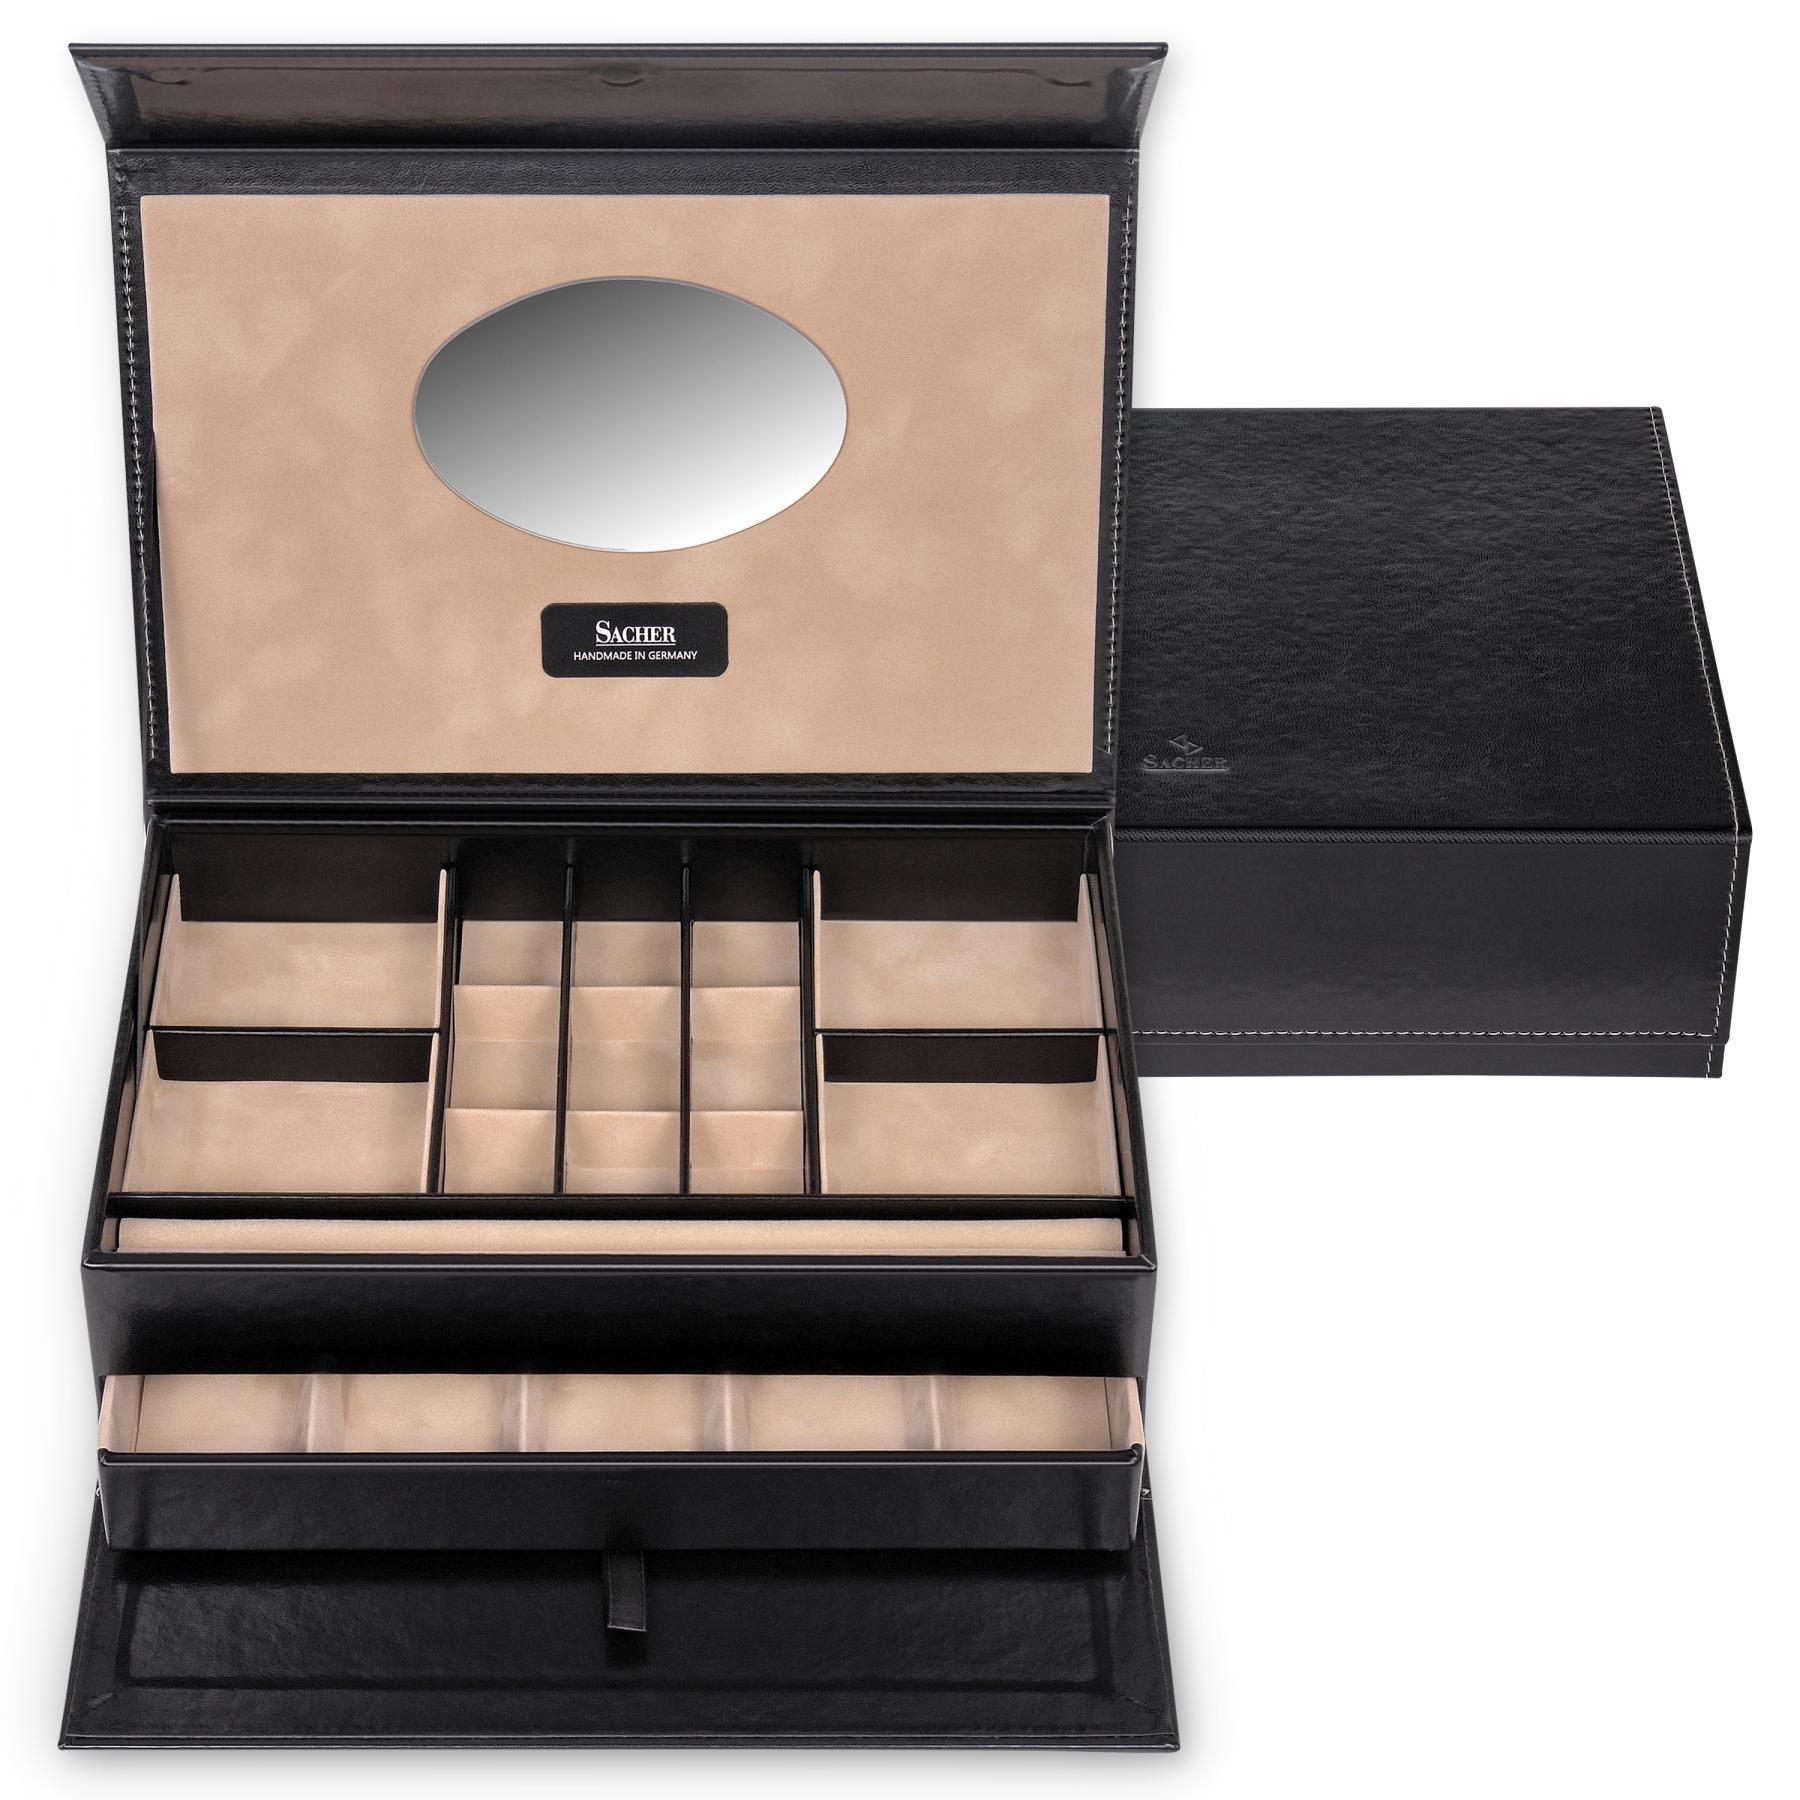 safe box    black   new classic